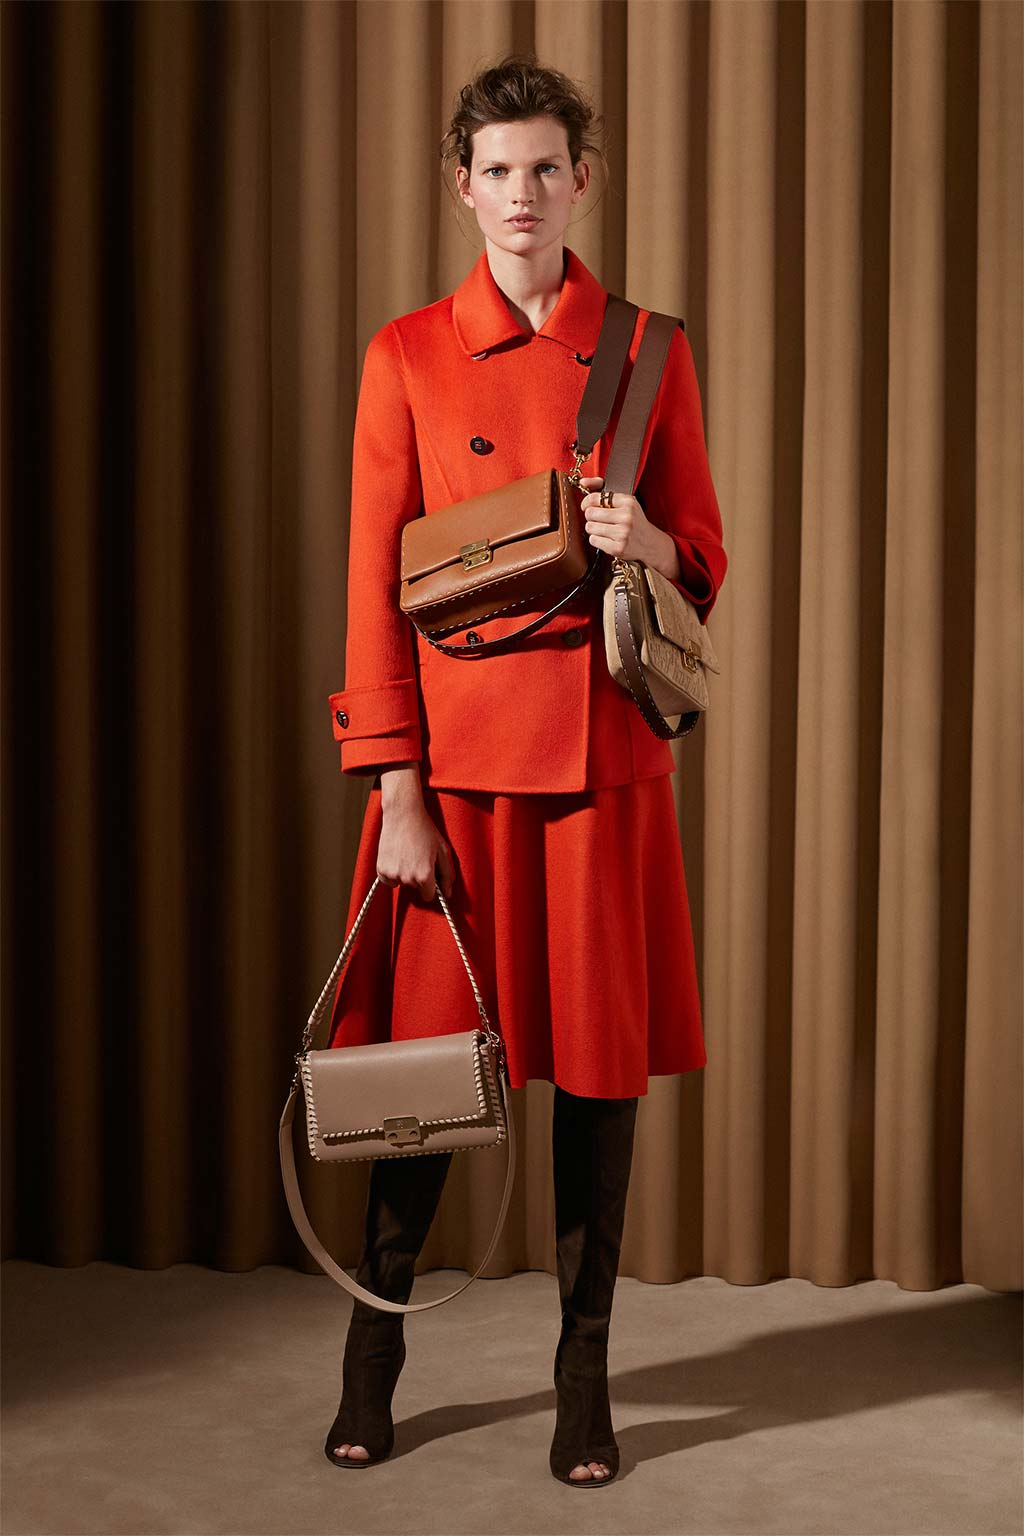 CH Carolina Herrera. New womenswear collection Spotlight. Look 07